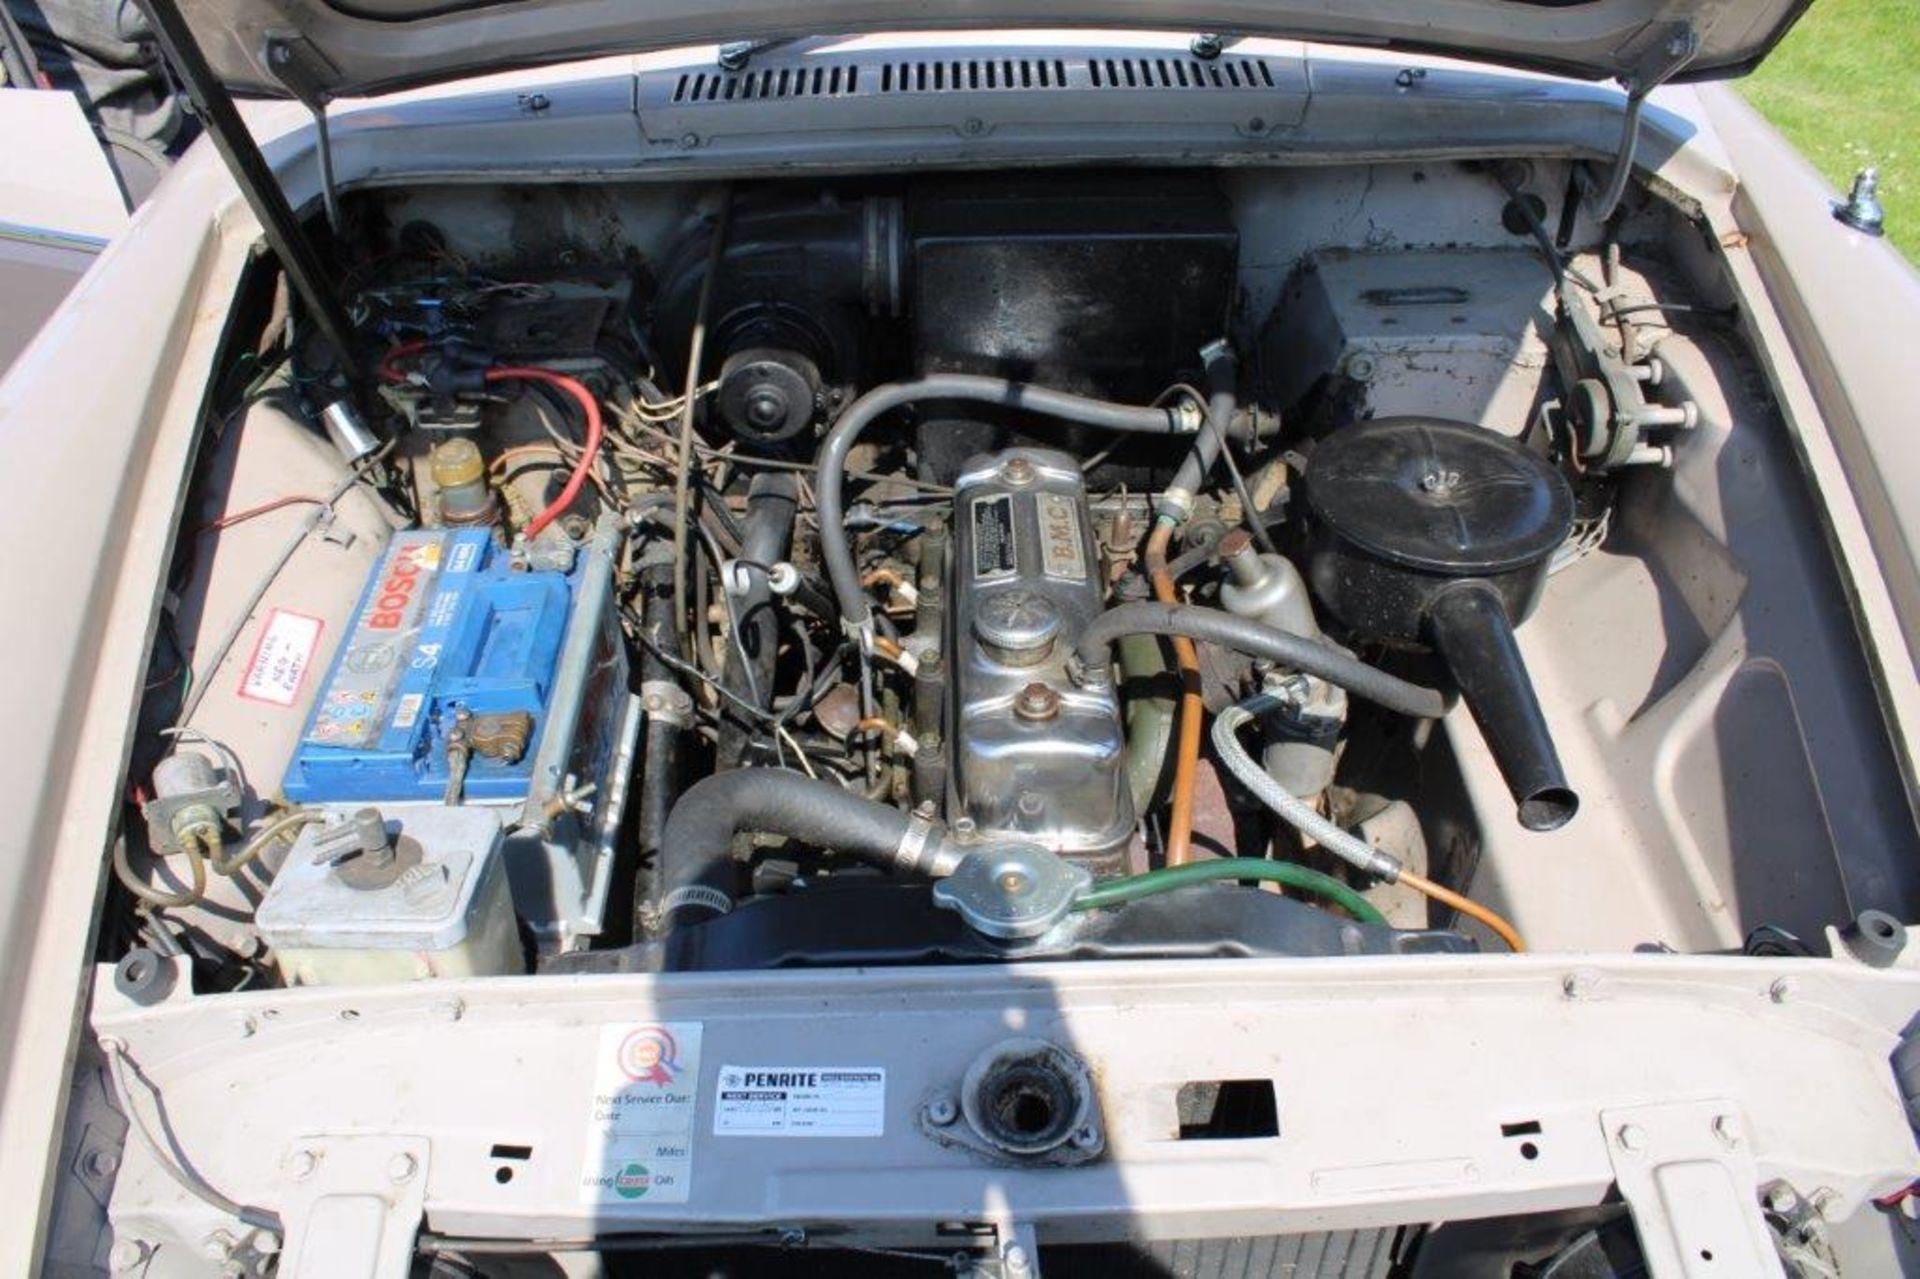 1969 Wolseley 16/60 Auto - Image 23 of 31